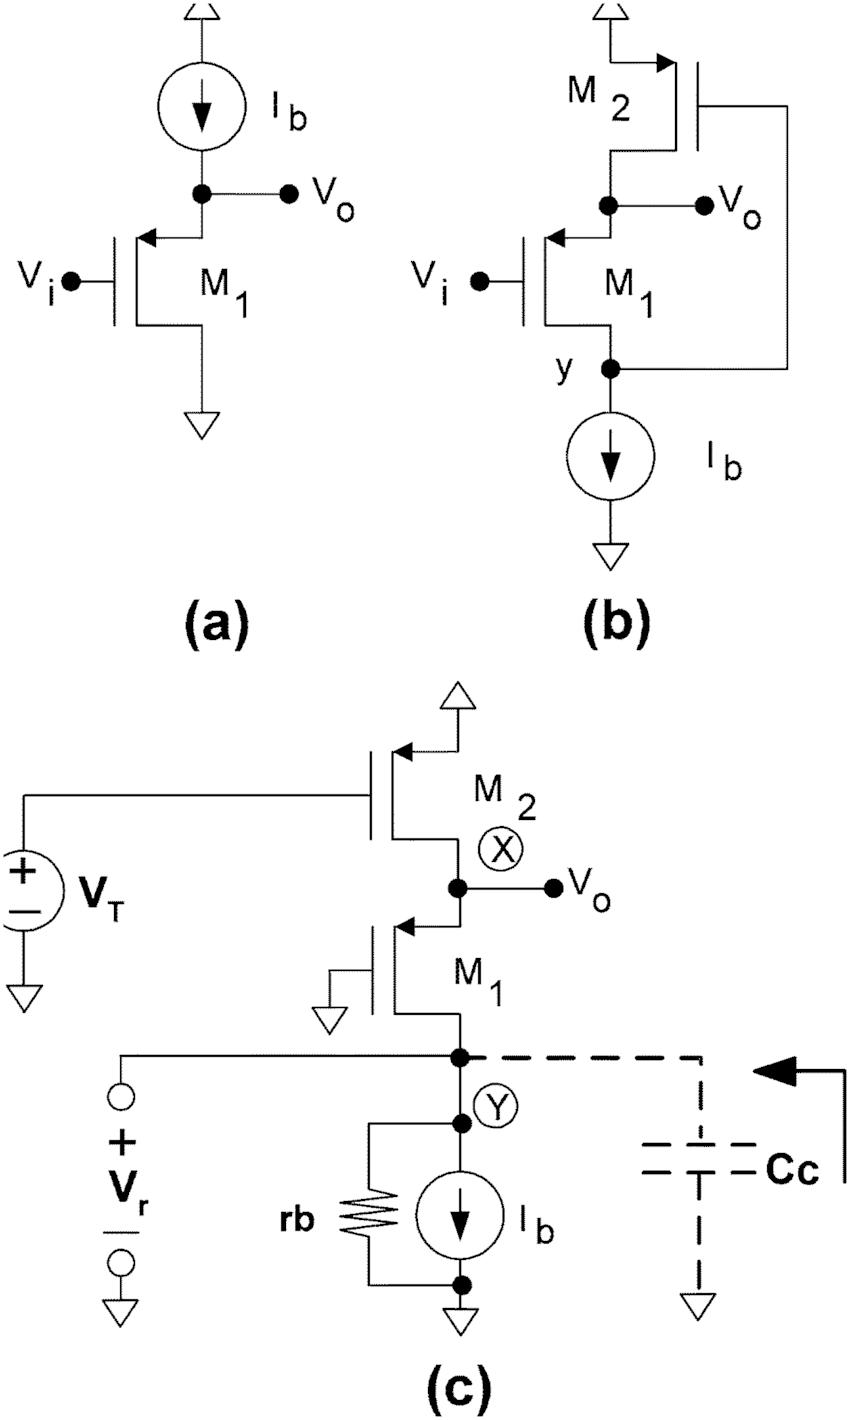 (a) Common-drain amplifier (voltage follower). (b) FVF. (c